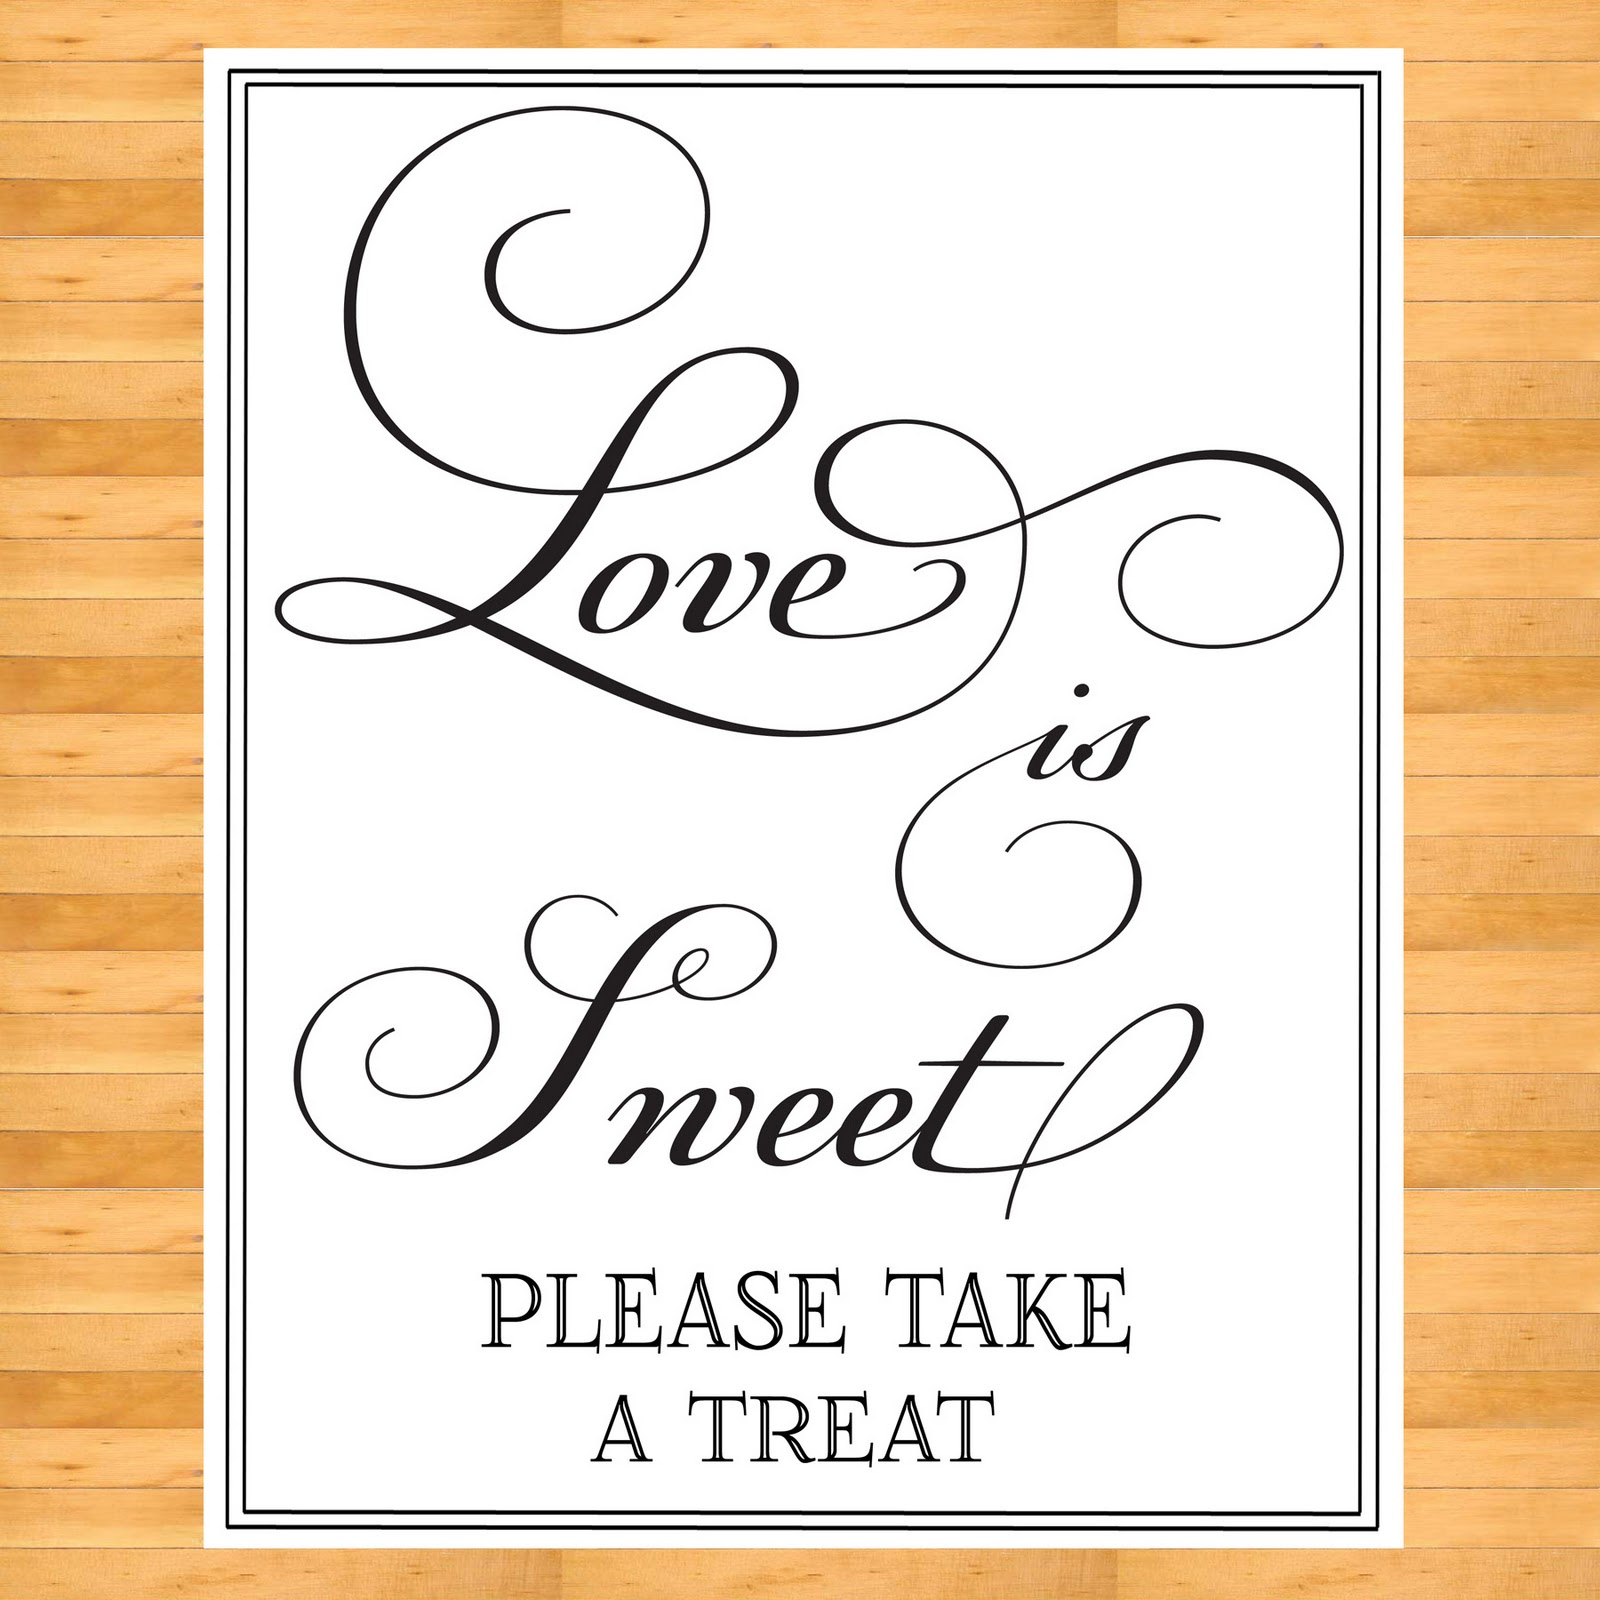 Digital Bunny's Designs: Love is Sweet Sign